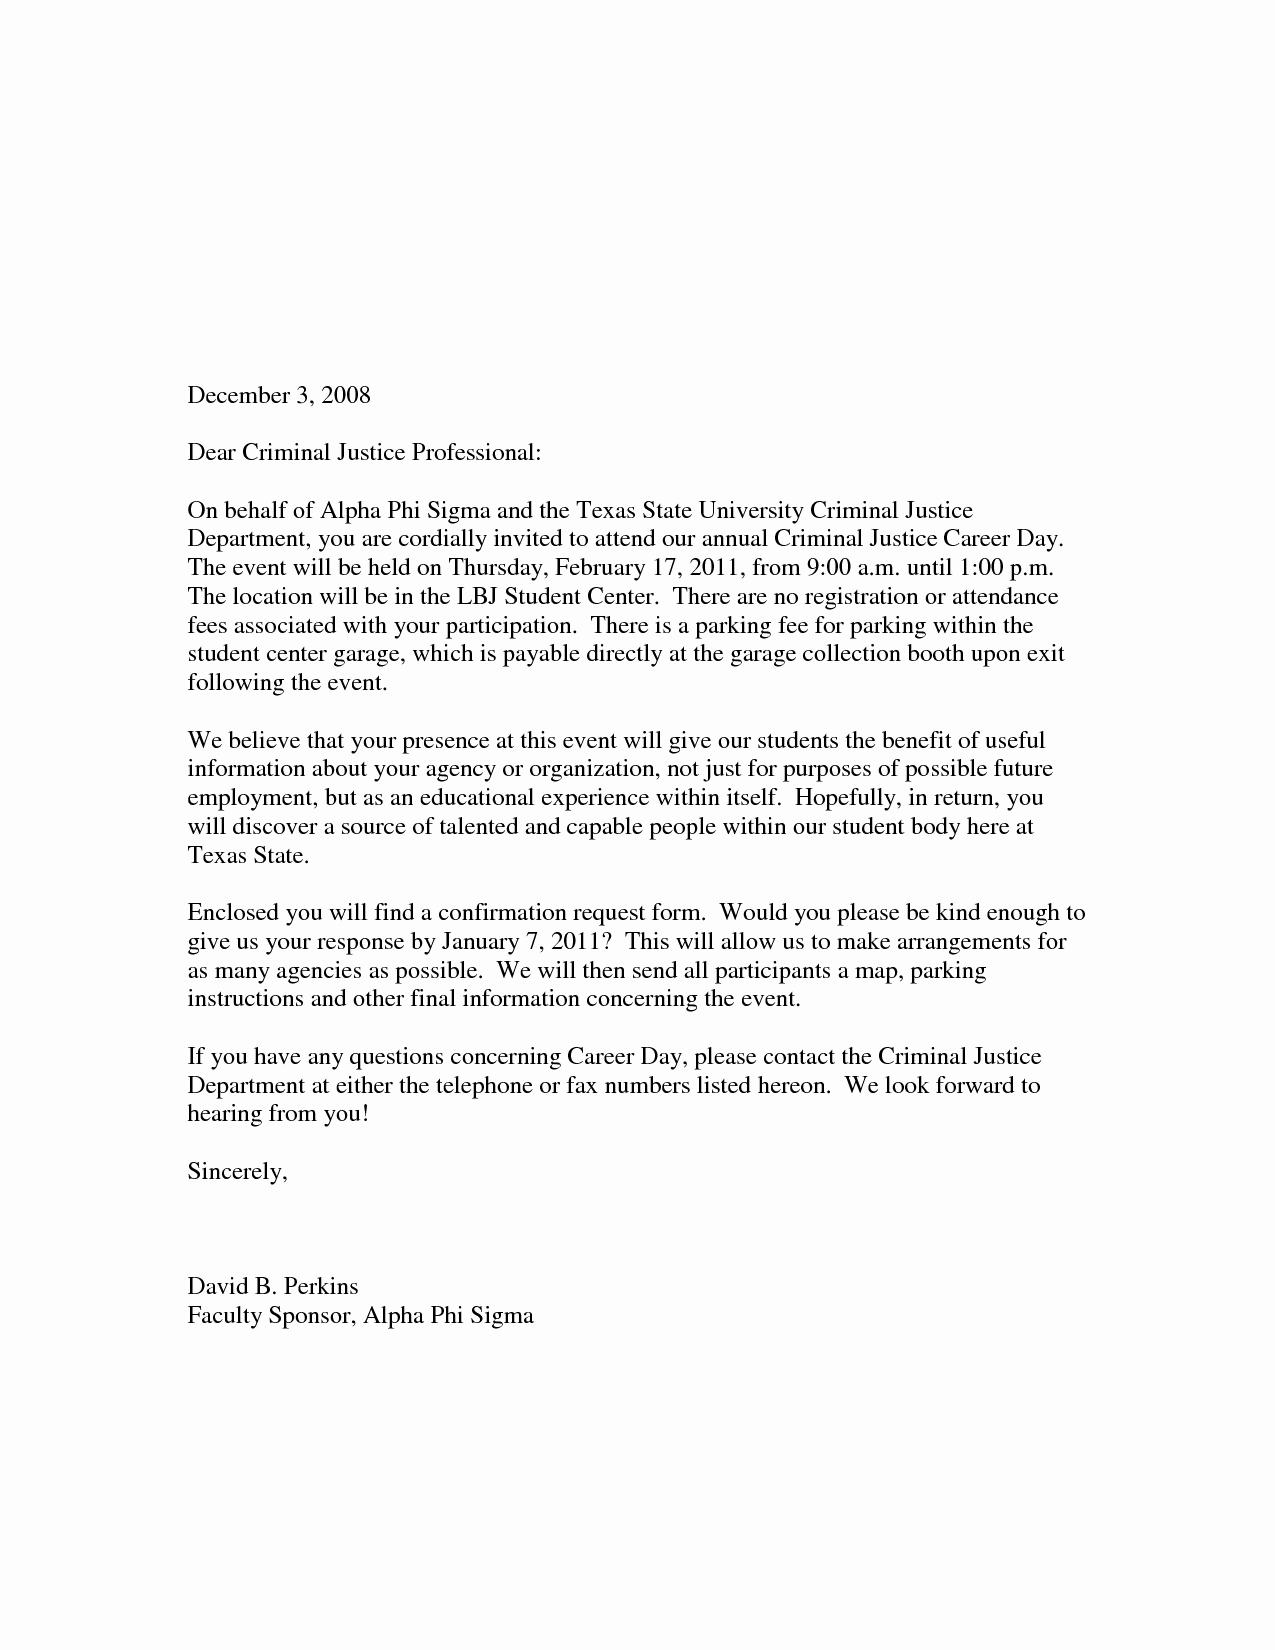 Samples Of Invitation Letters Awesome Sample Career Day Invitation Letter School Yolanda